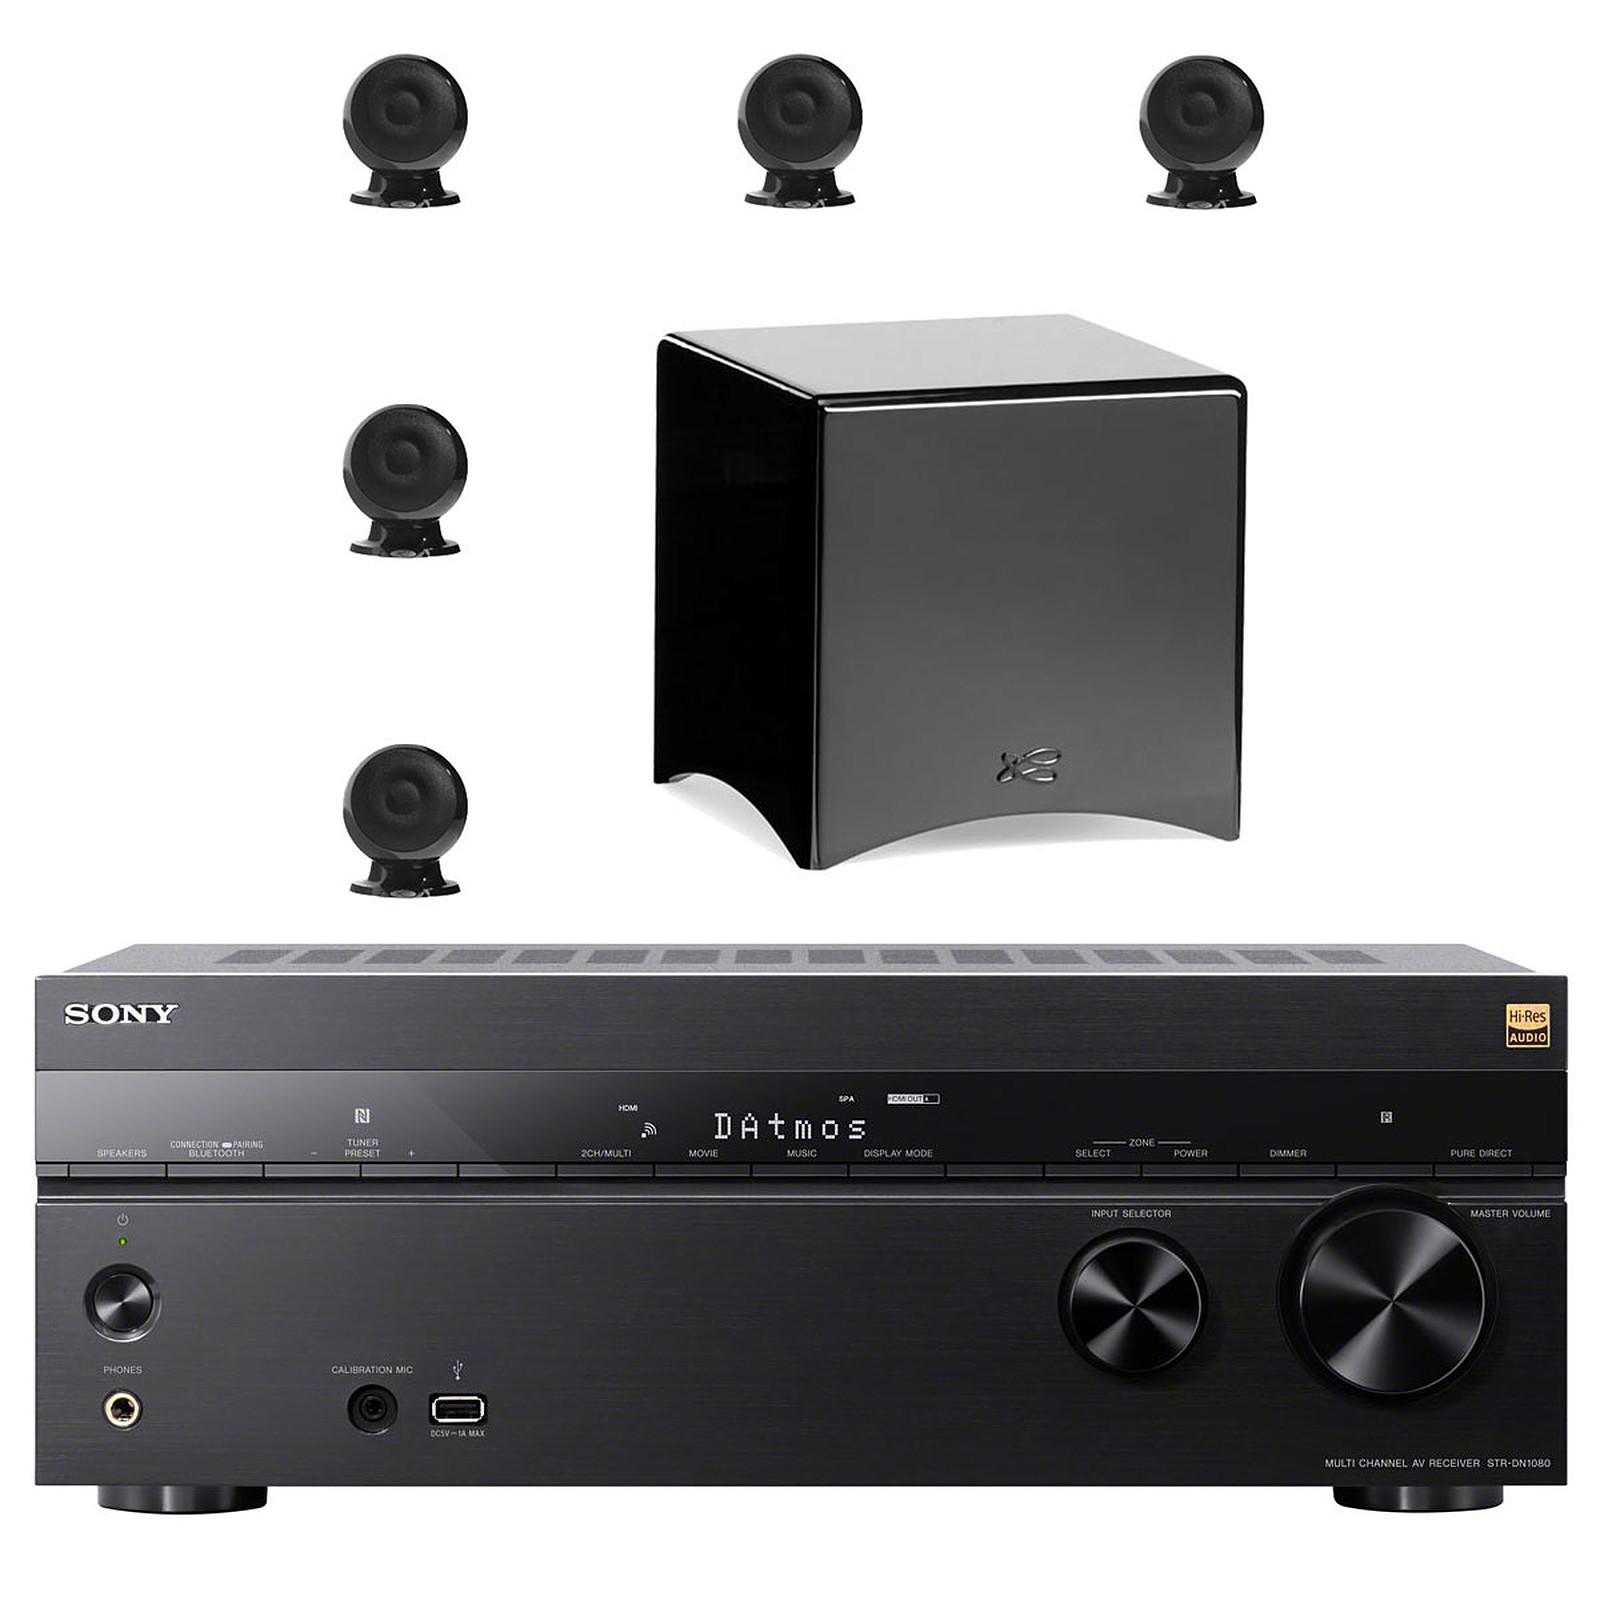 Sony STR-DN1080 + Cabasse pack Eole 3 5.1 WS Noir